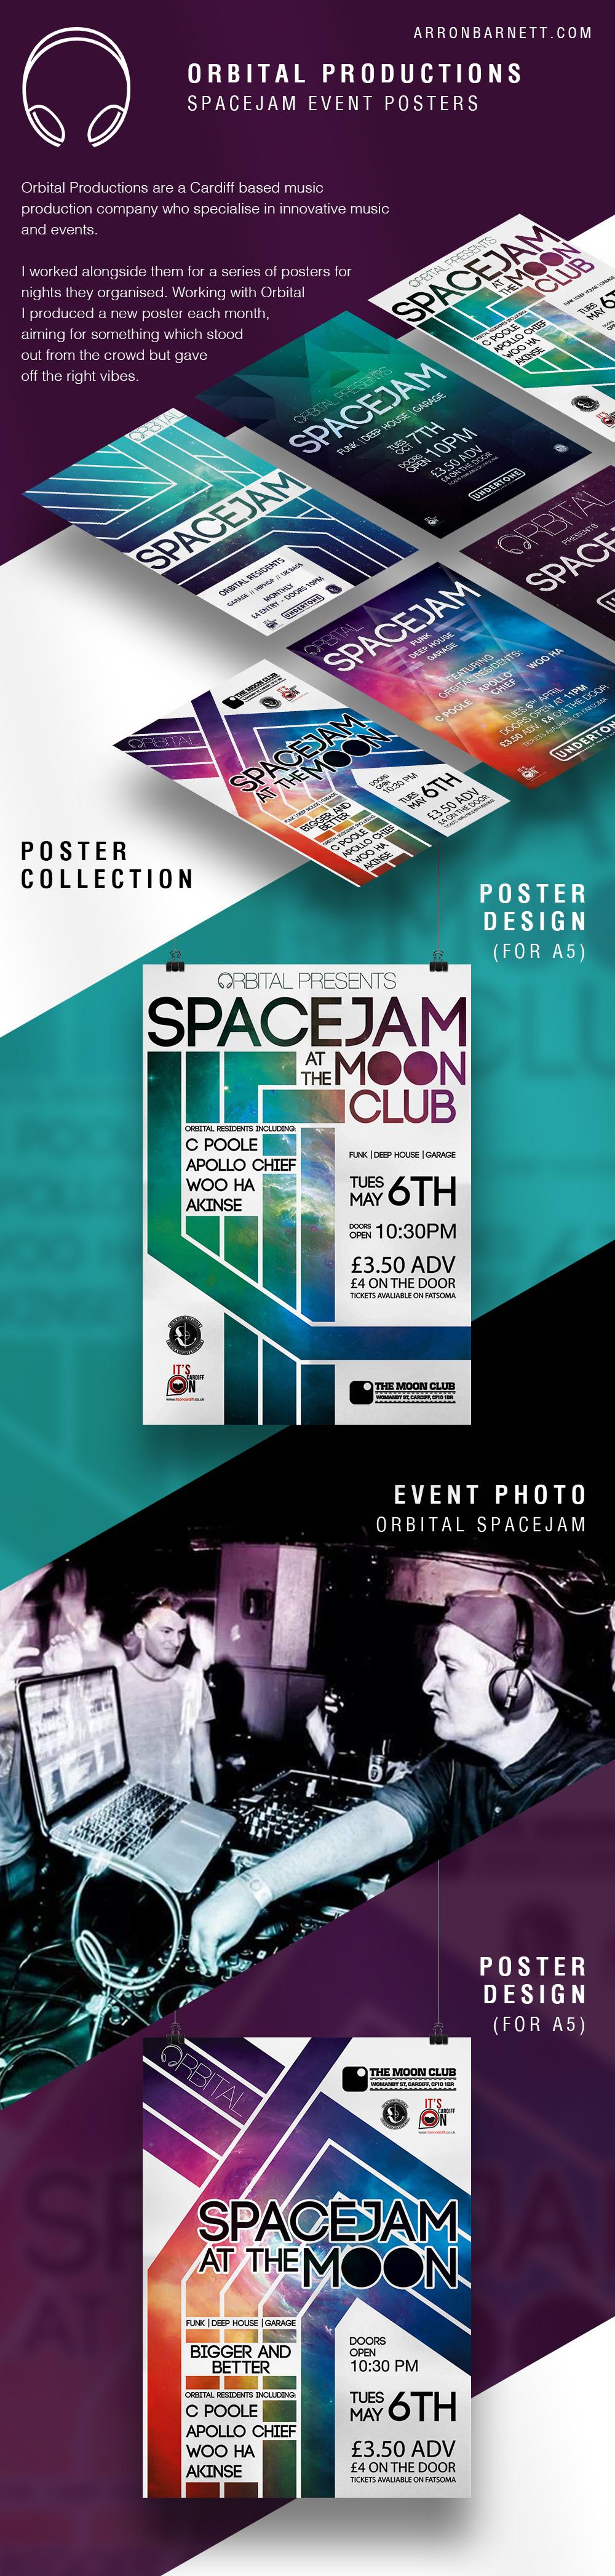 Orbital Spacejam Poster Collection